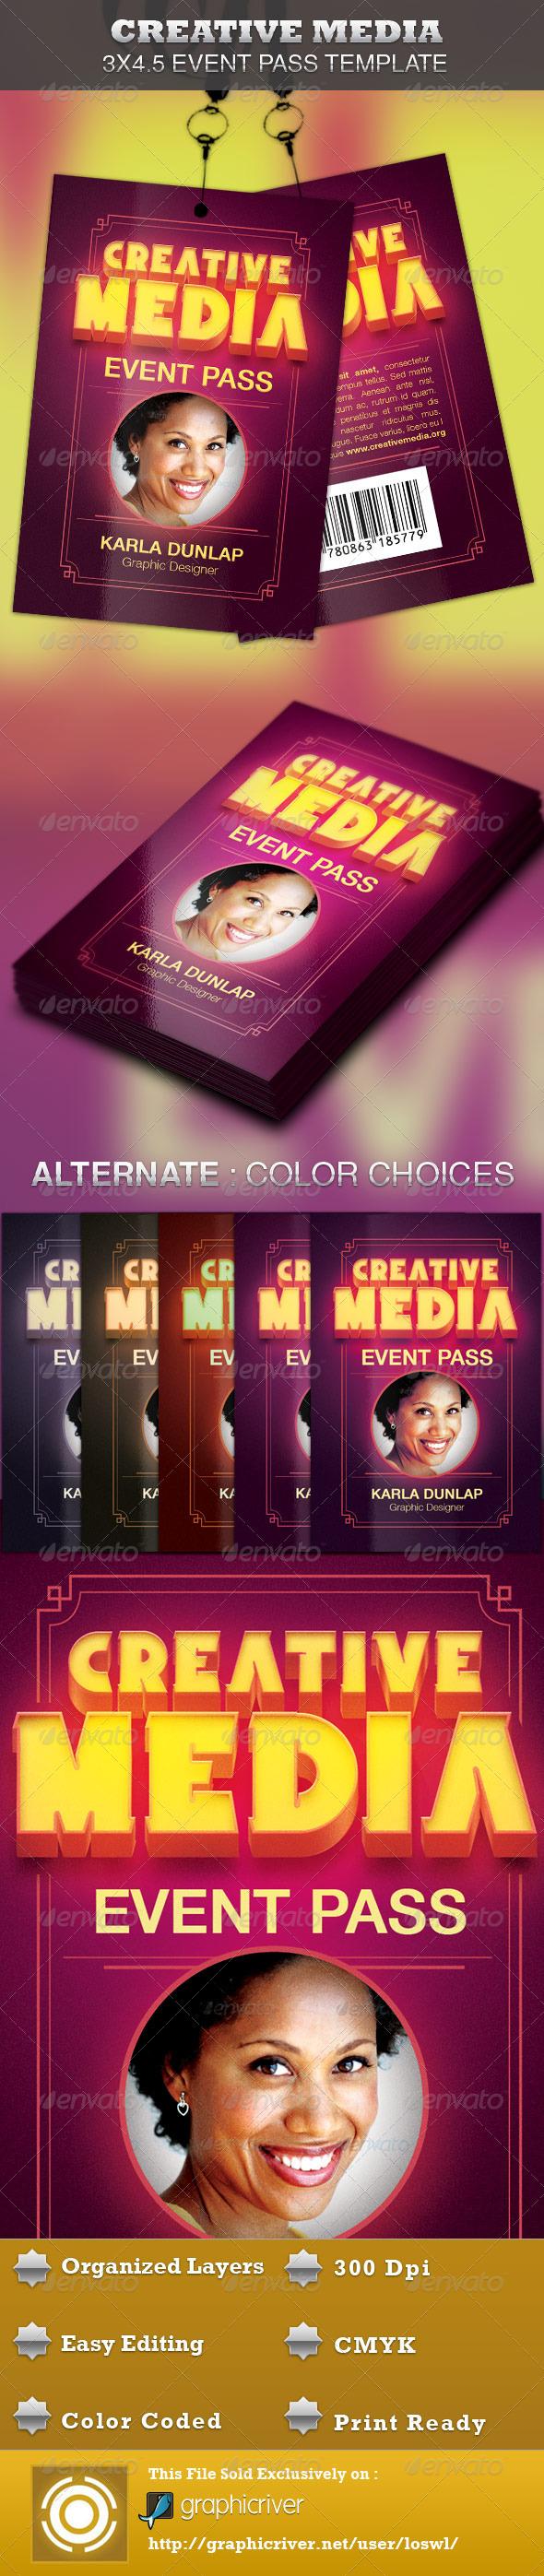 Creative Media Event Pass Template - Miscellaneous Print Templates